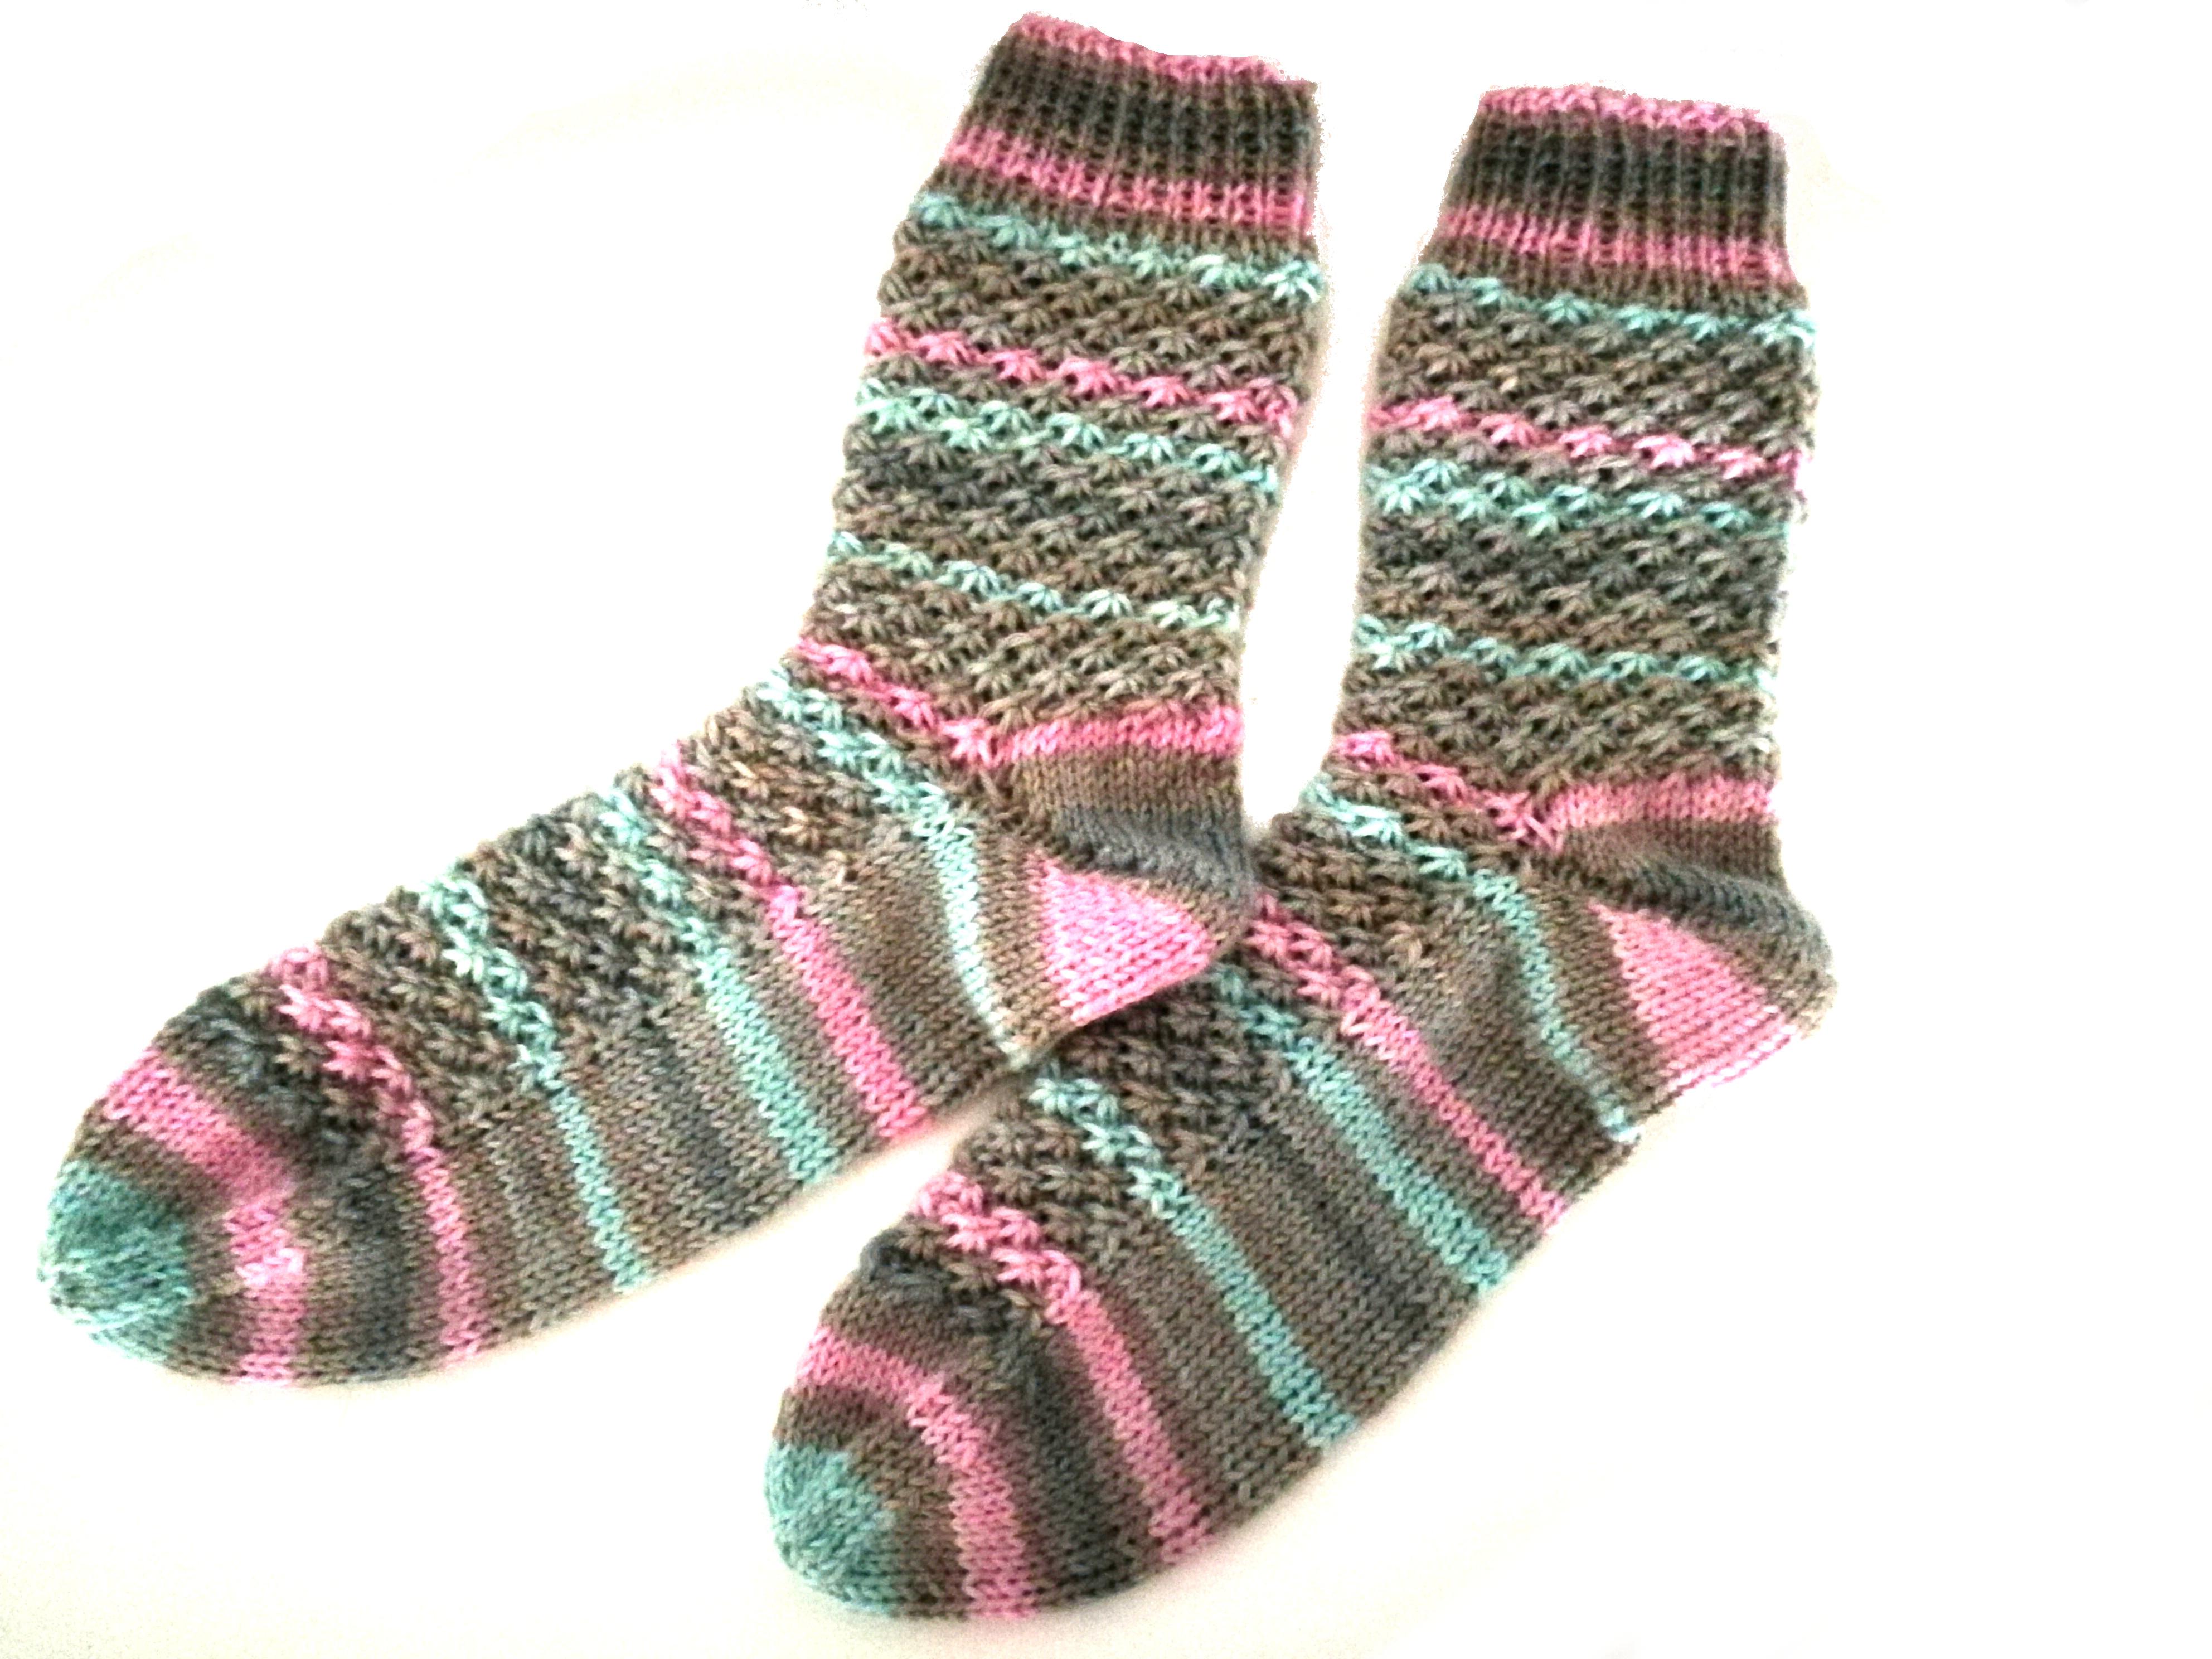 Strickanleitung Kuschel Socken, Größe 20 20